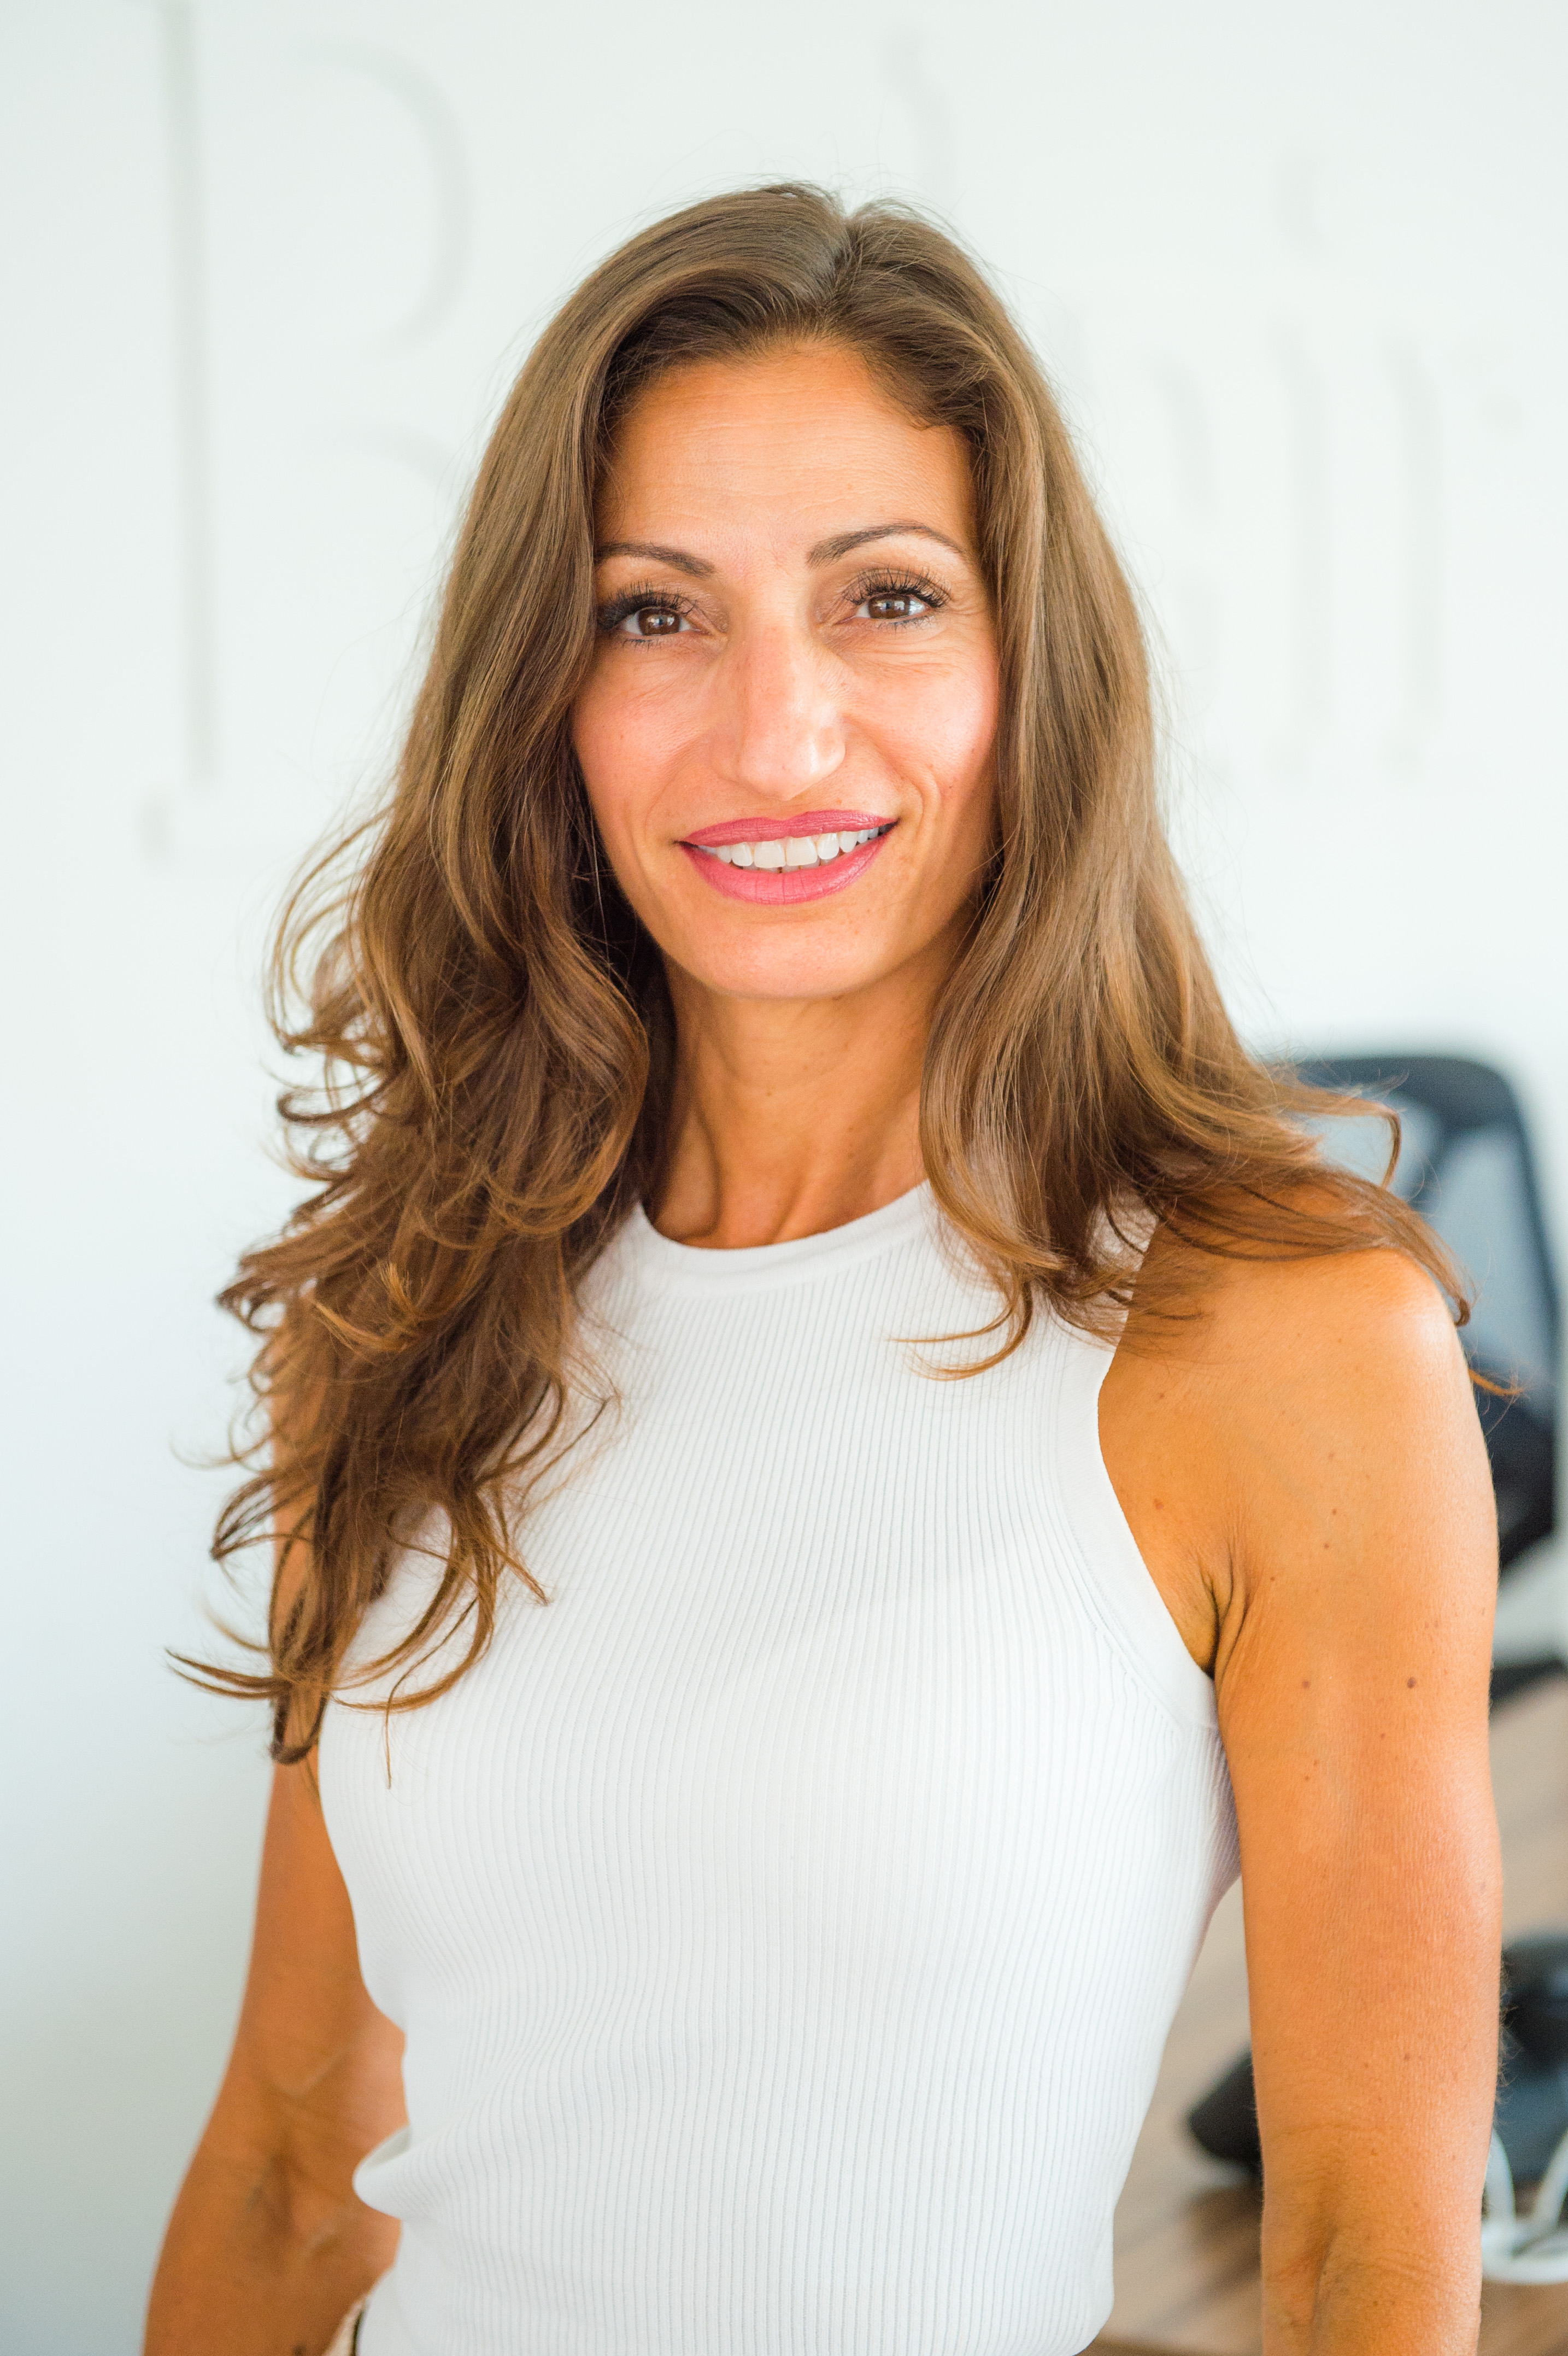 Victoria Spiteri